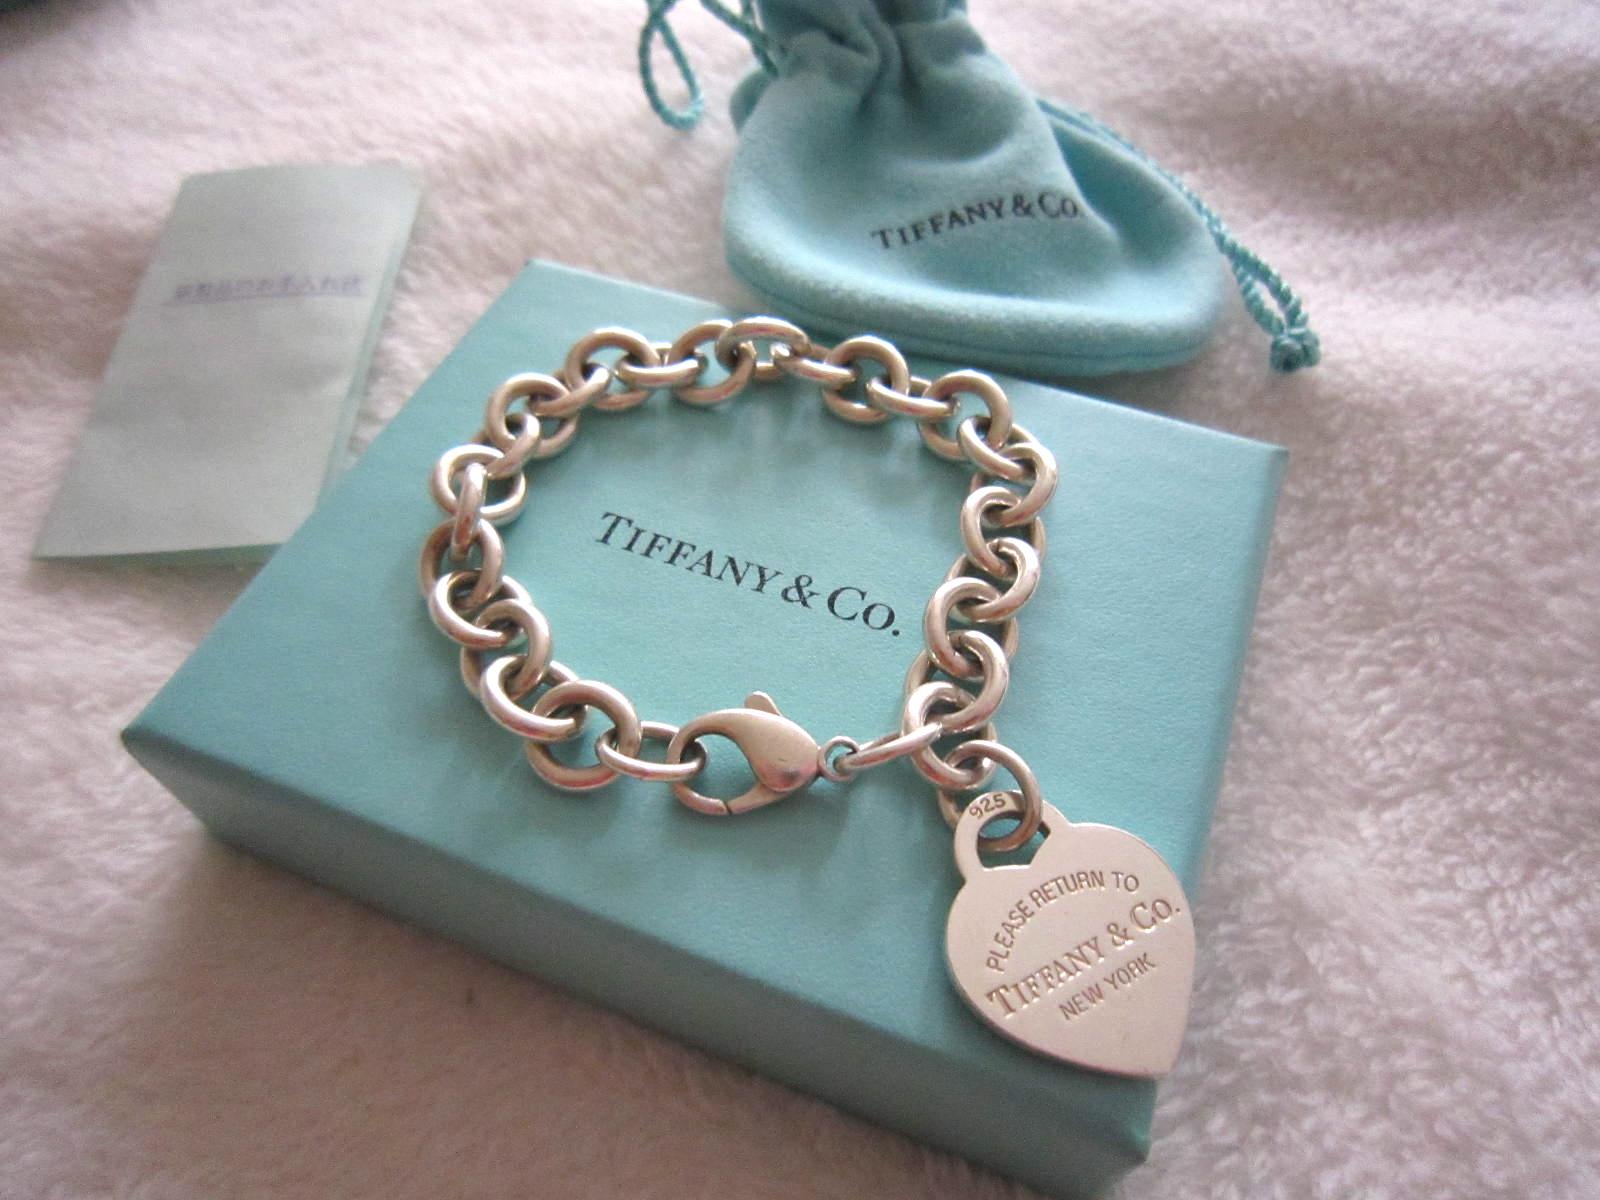 a3d1a76d5 Tiffany & Co 925 Heart Charm Bracelet - Luxurylana Boutique